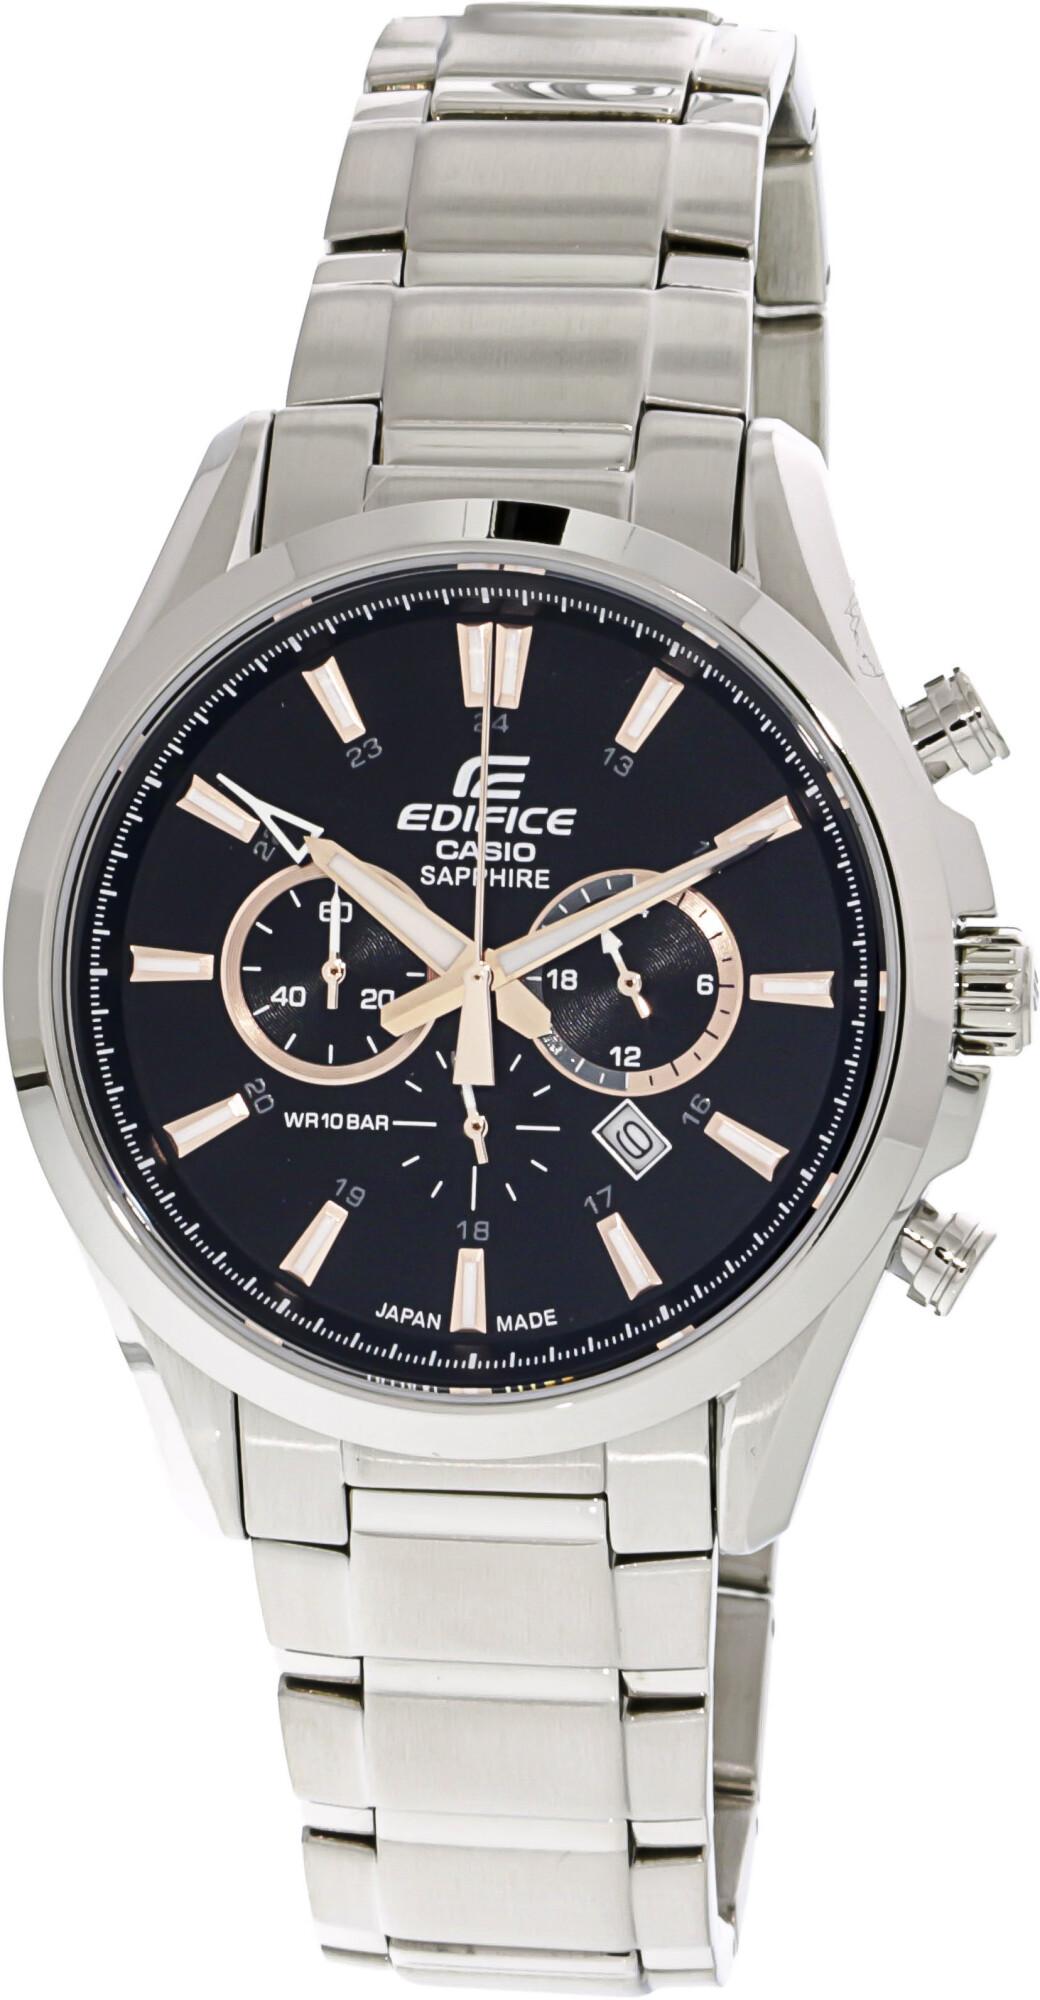 Casio Men's Edifice EFB504JD-1A9 Silver Stainless-Steel Quartz Fashion Watch